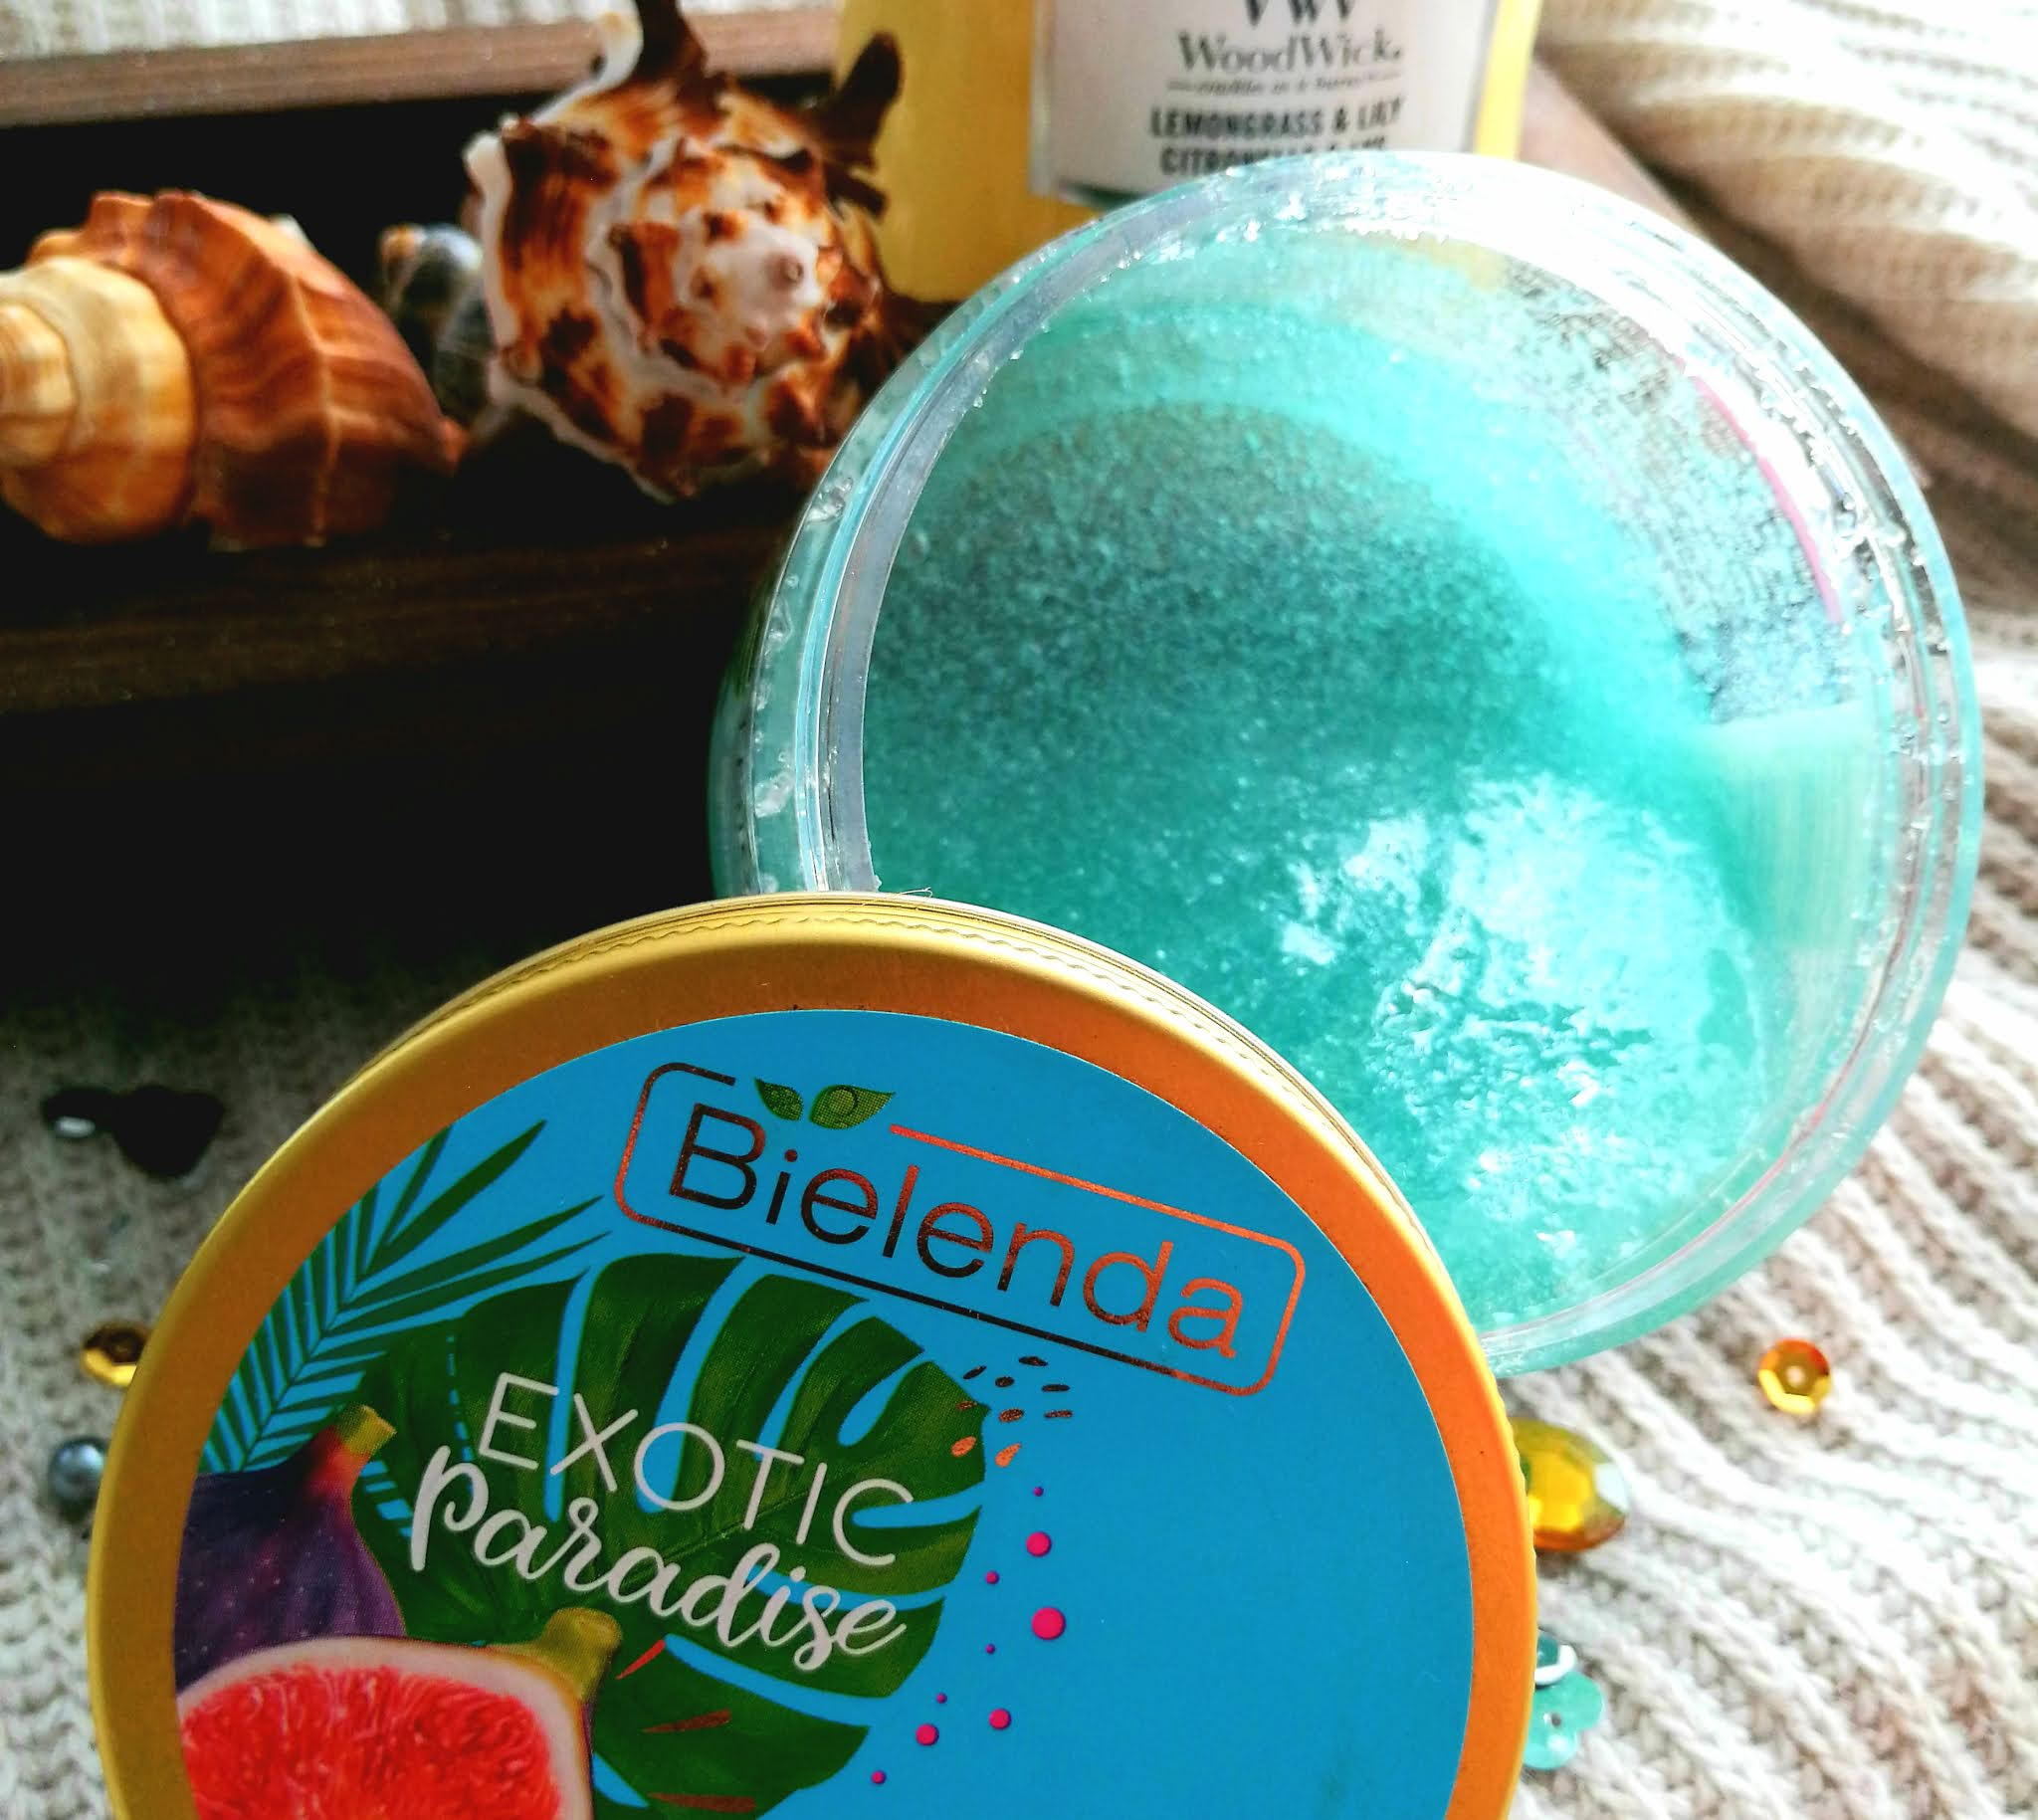 Bielenda EXOTIC PARADISE - cukrowy peeling do ciała Aneta Lason Beauty Talks